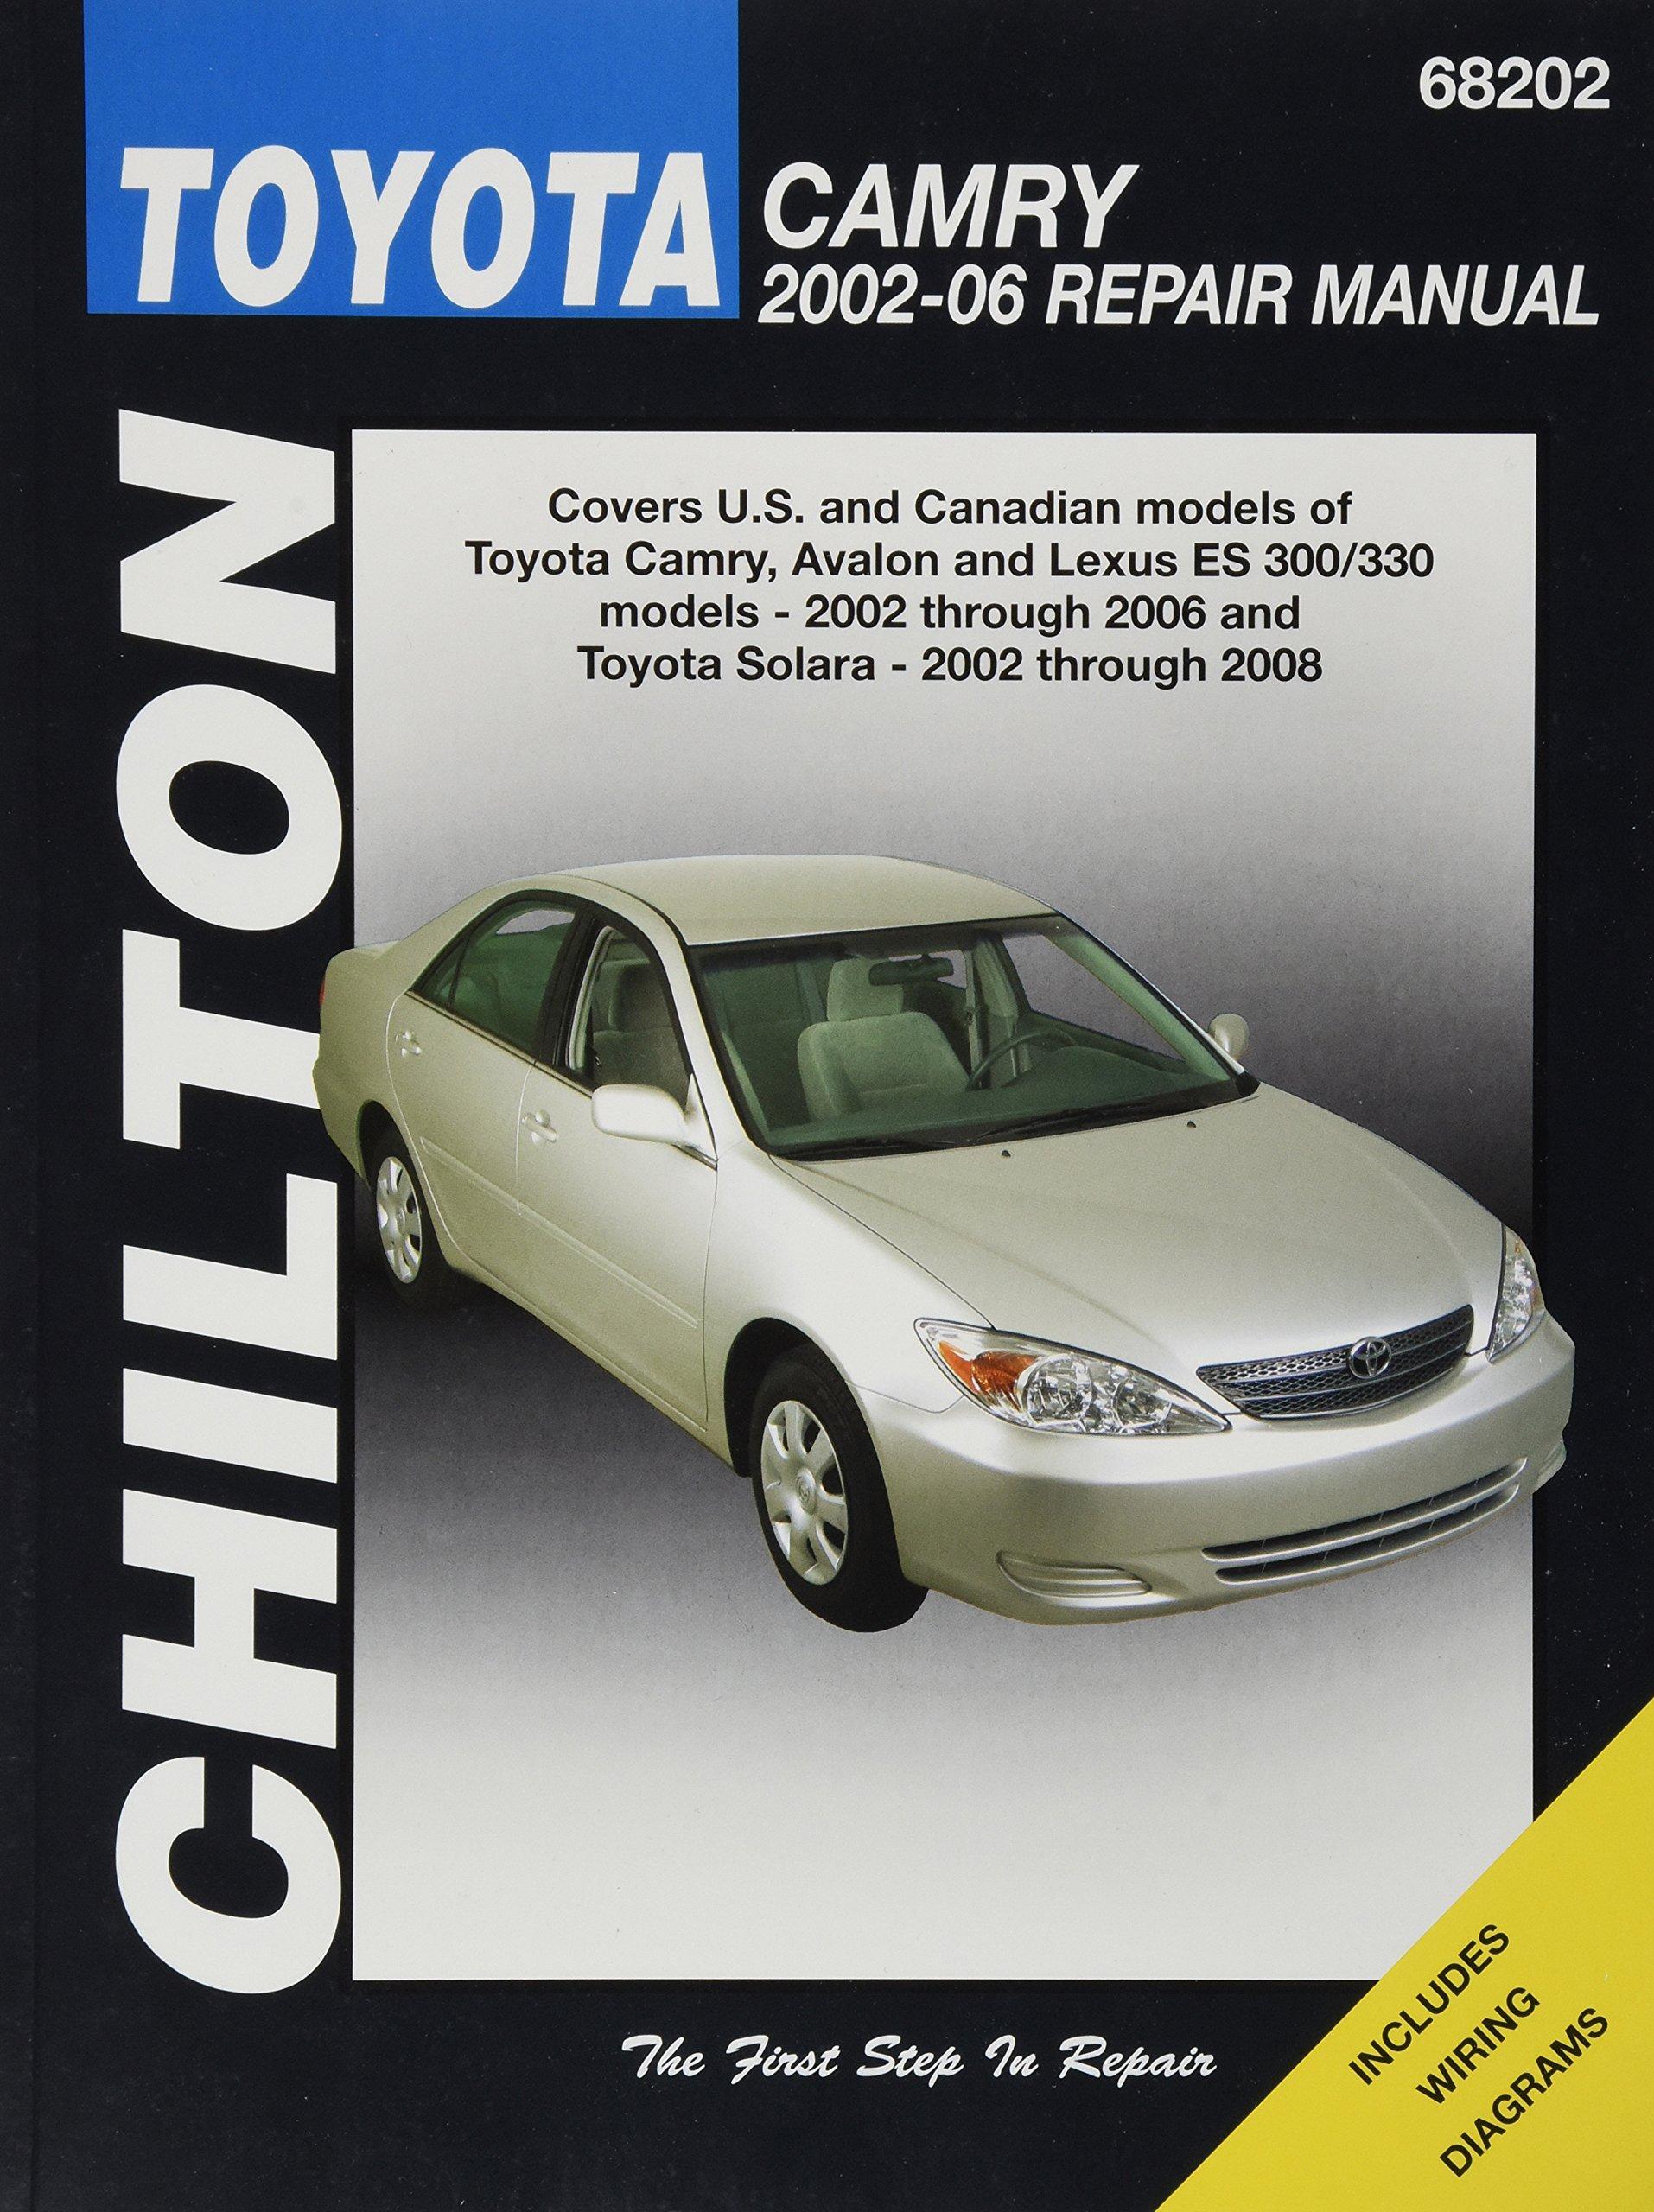 Chilton Total Car Care Toyota Camry, Avalon & Lexus ES 300/330 2002-